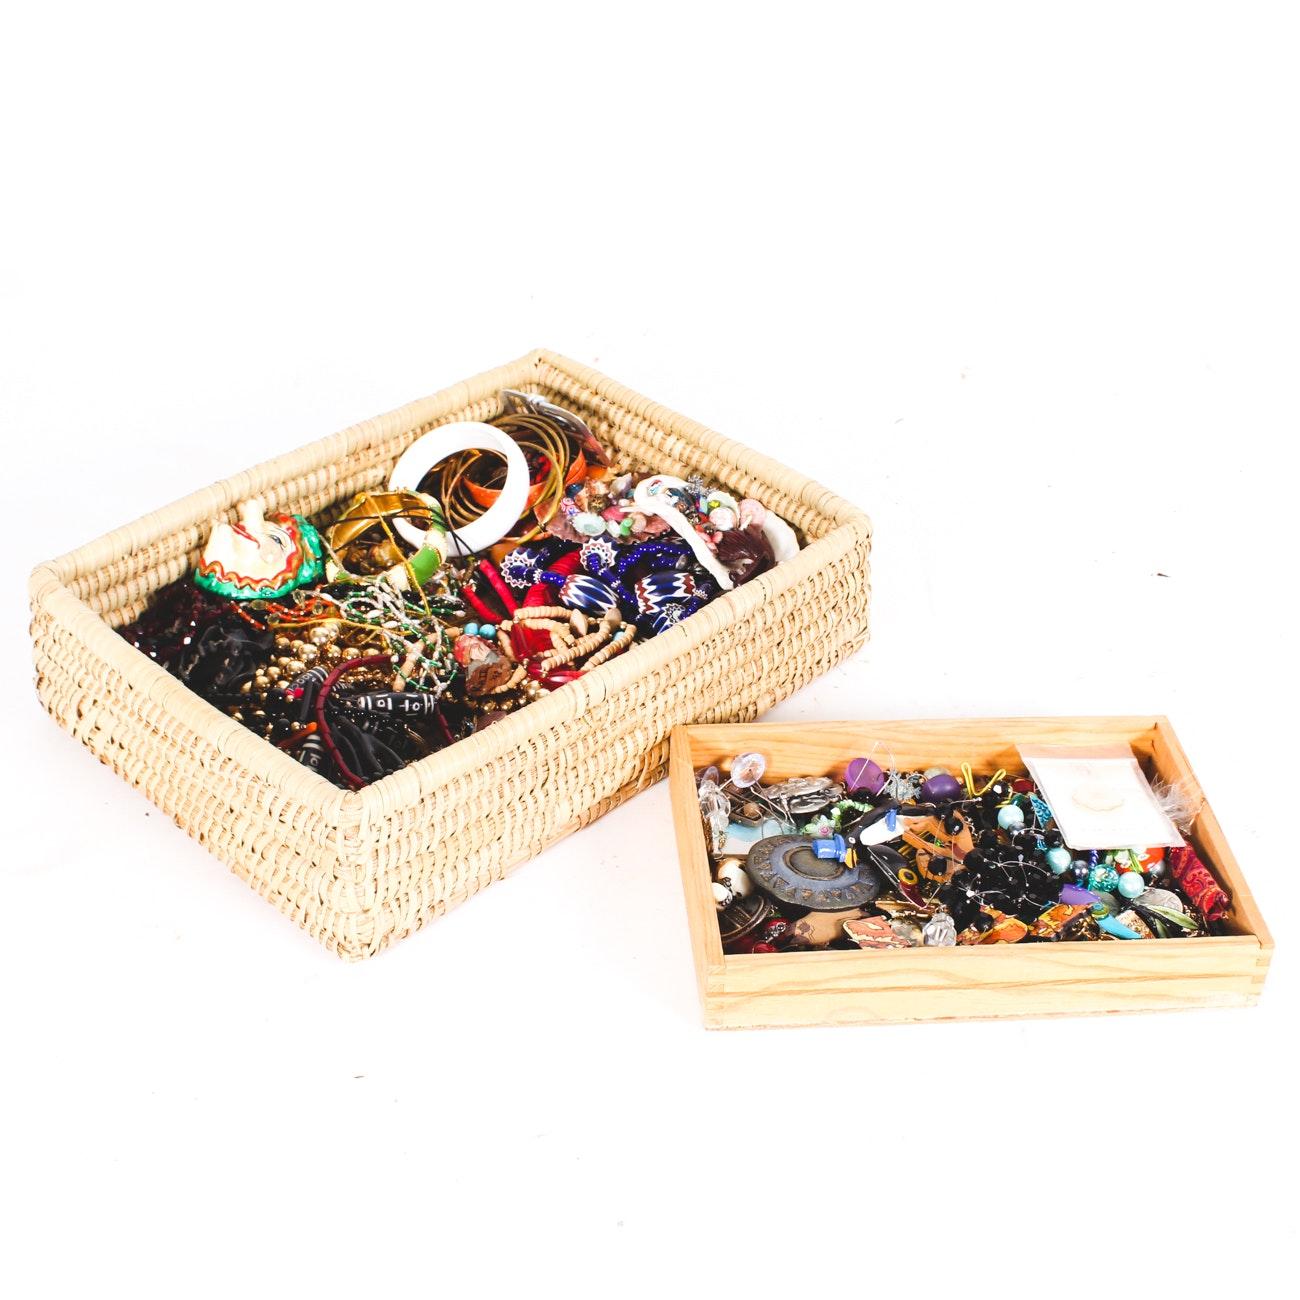 Large Assortment of Costume Jewelry